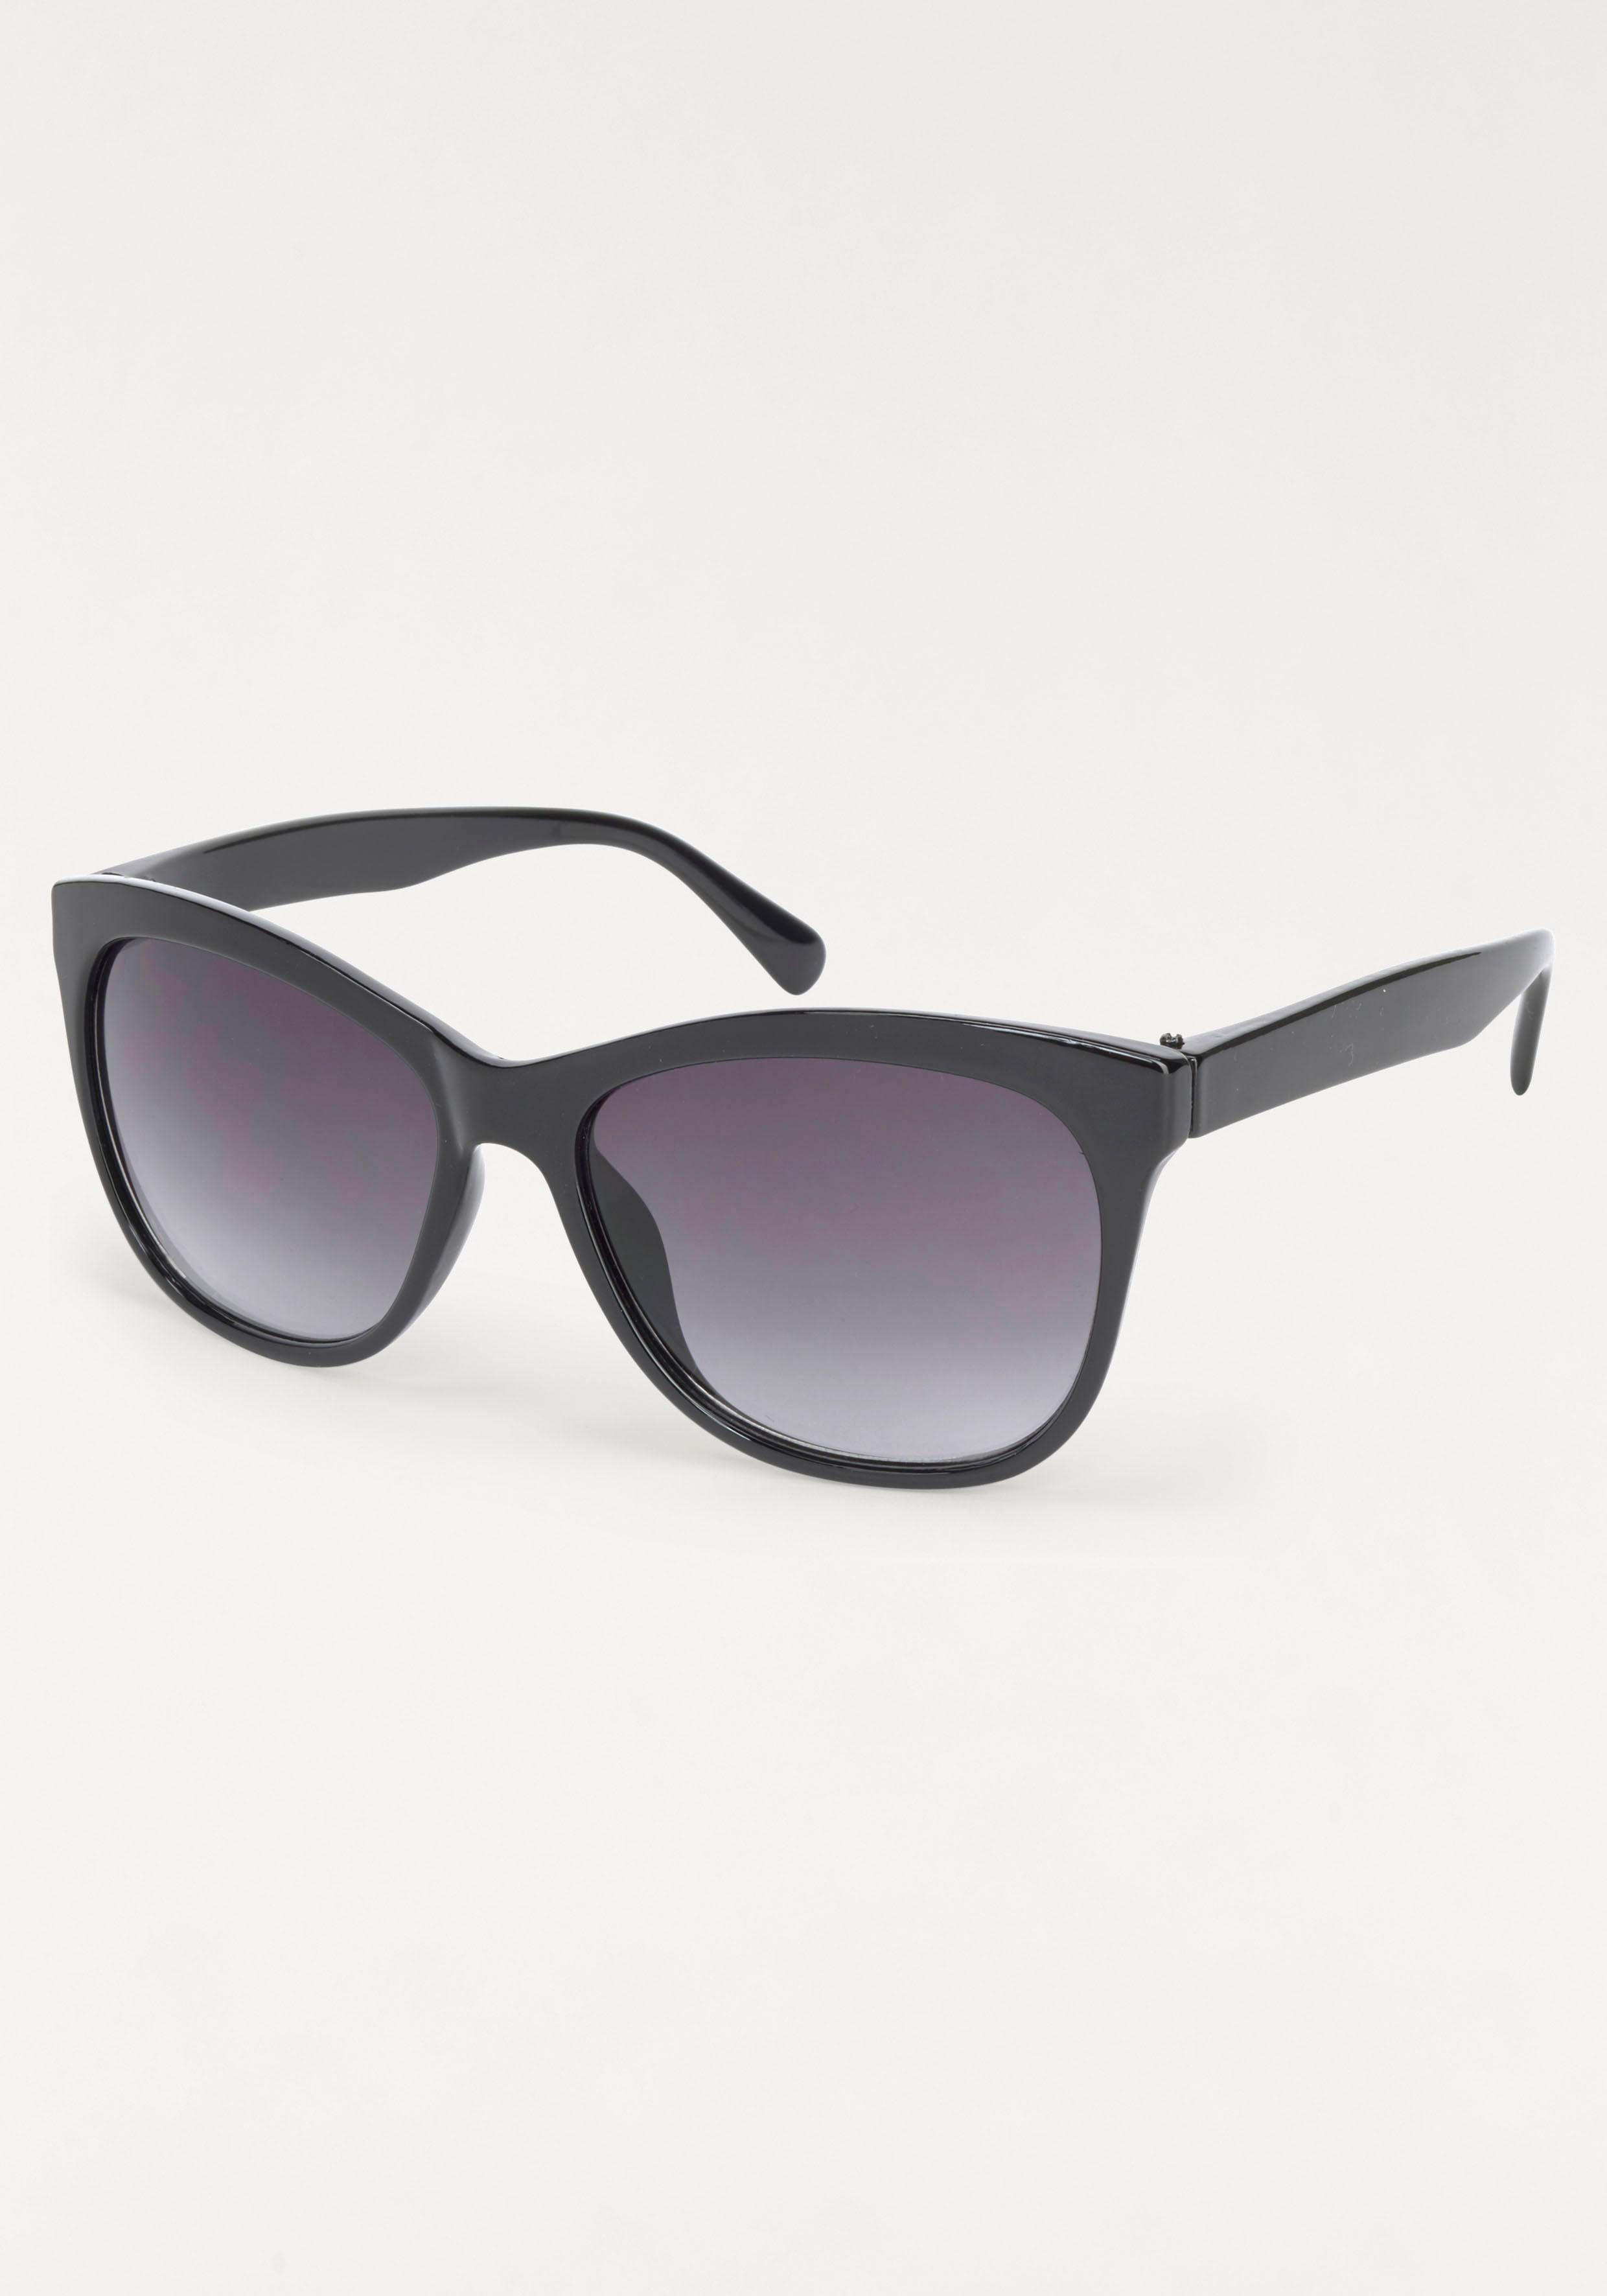 Sonnenbrille Retro Look, leichte Butterfly Optik